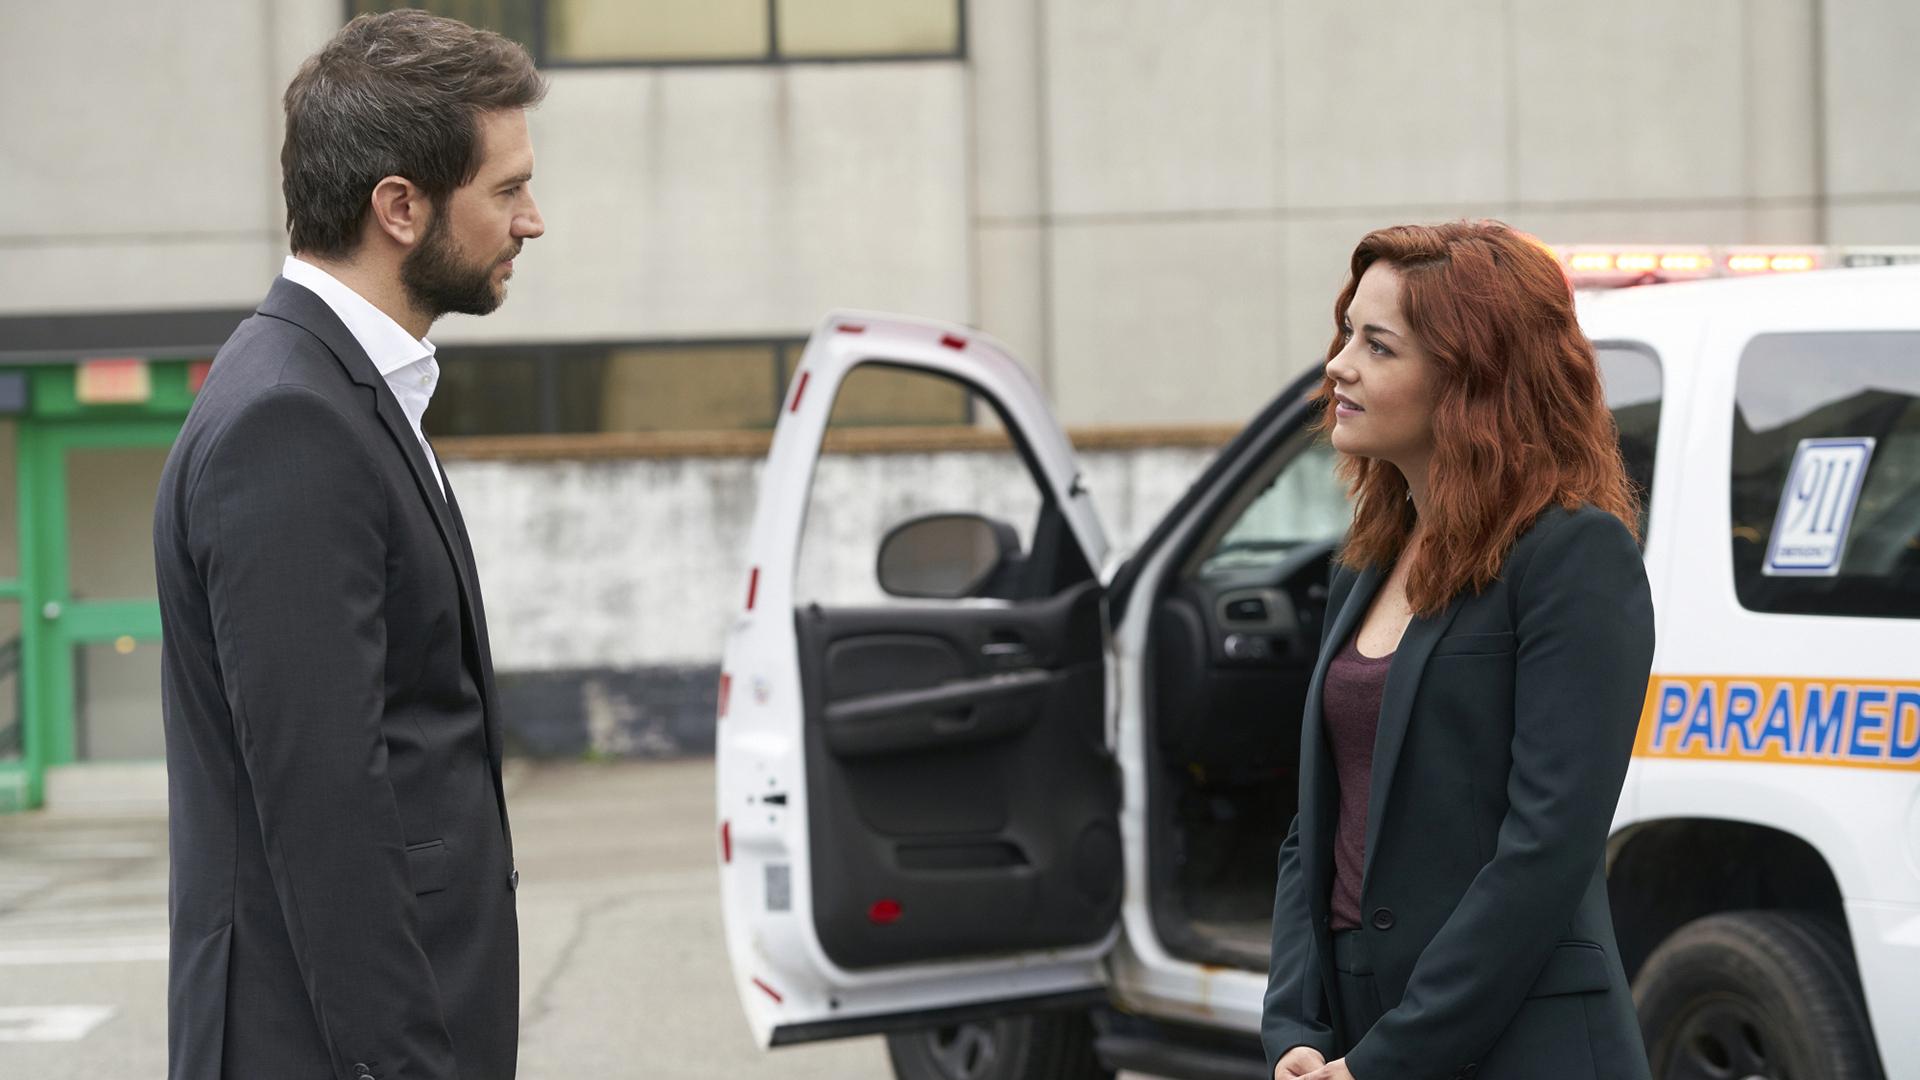 Luke Roberts as Eric Beaumont and Sarah Greene as Maxine Carlson